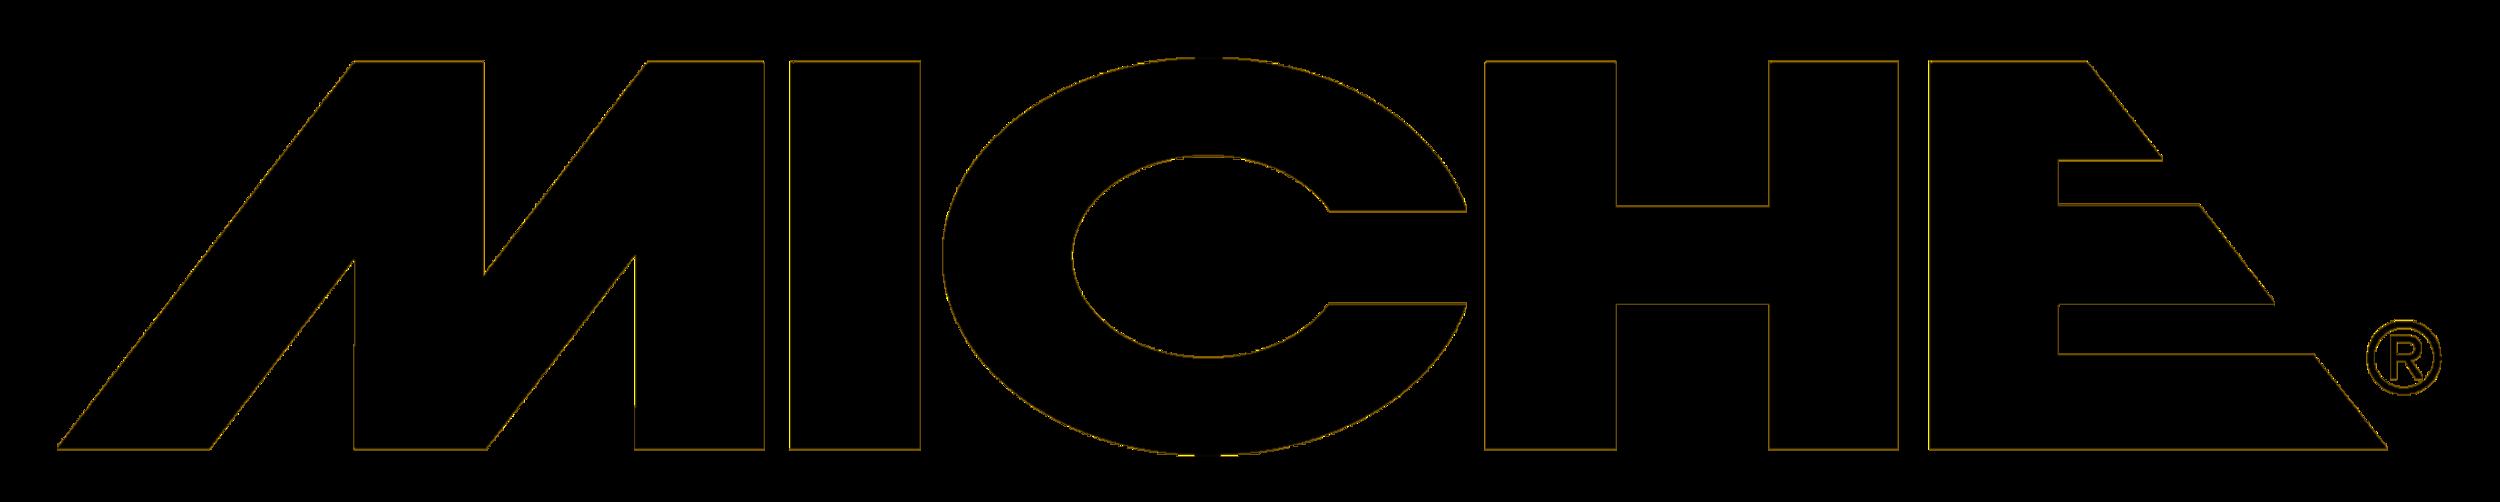 miche logo.png